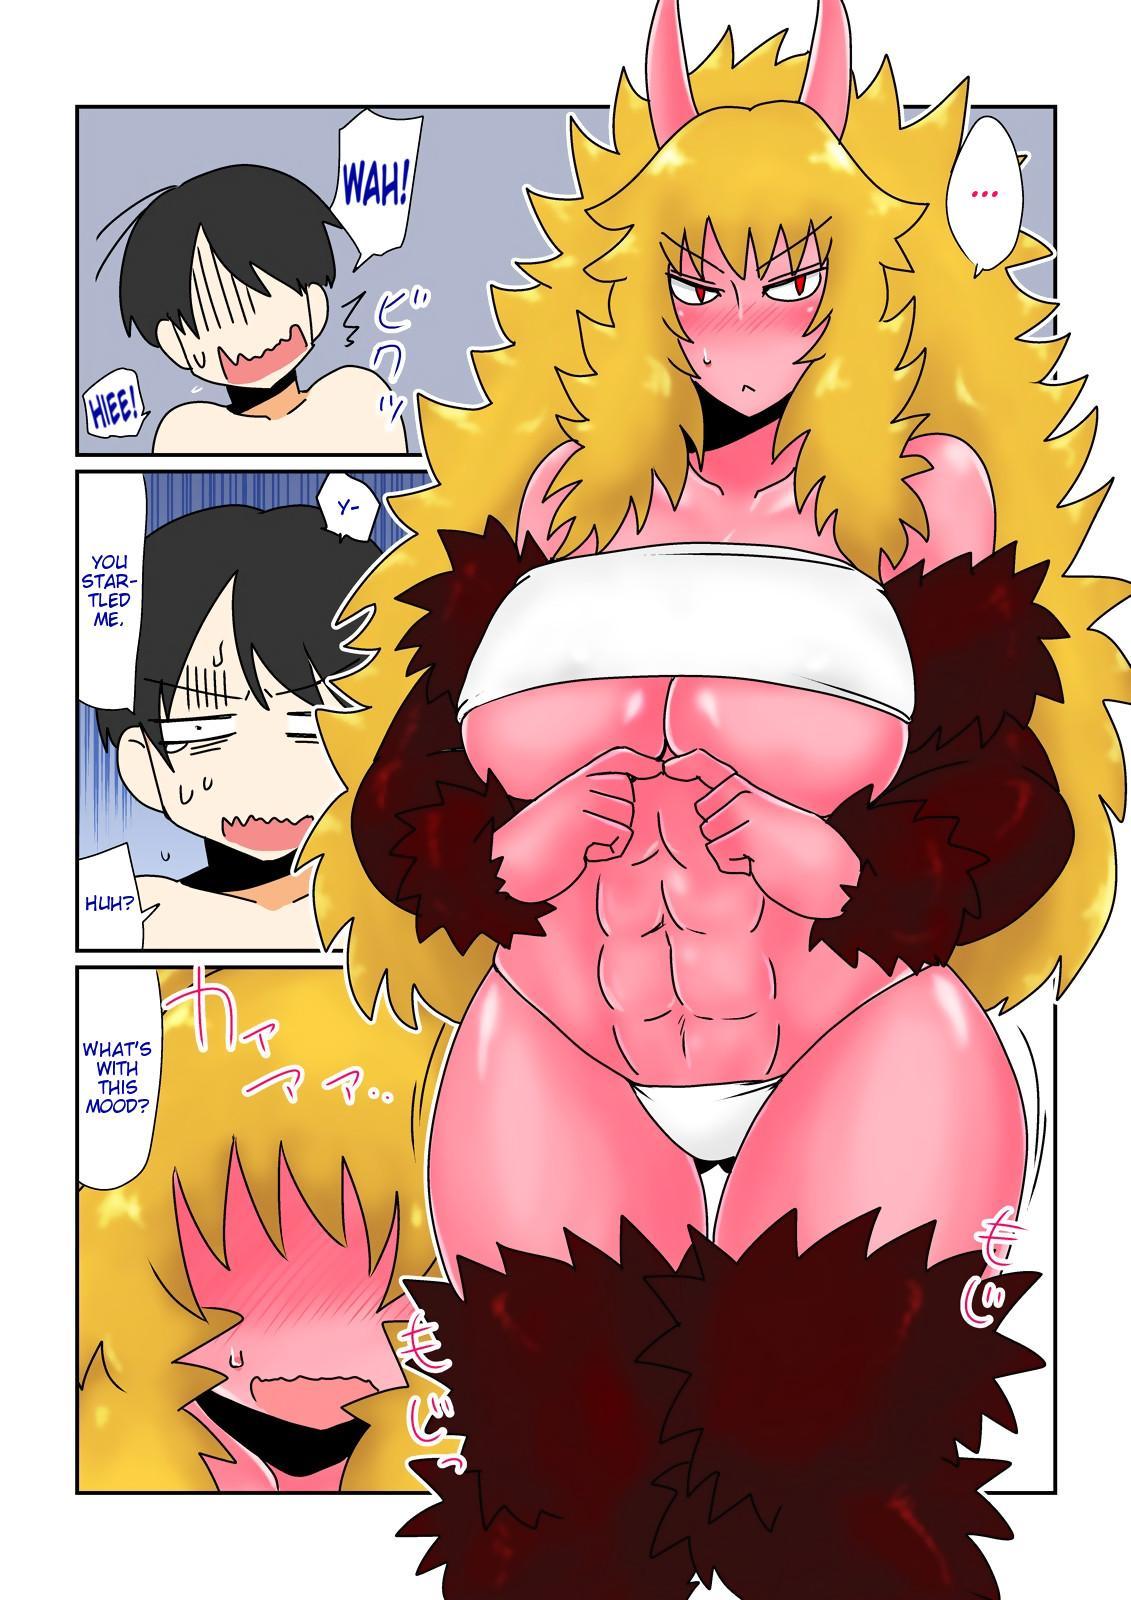 [Hroz] Game Over -Akahada Ogre Musume Hen- | Game Over 〜Red Skin Ogre Girl Edition〜 [English] [Digital] {Erelzen} 2